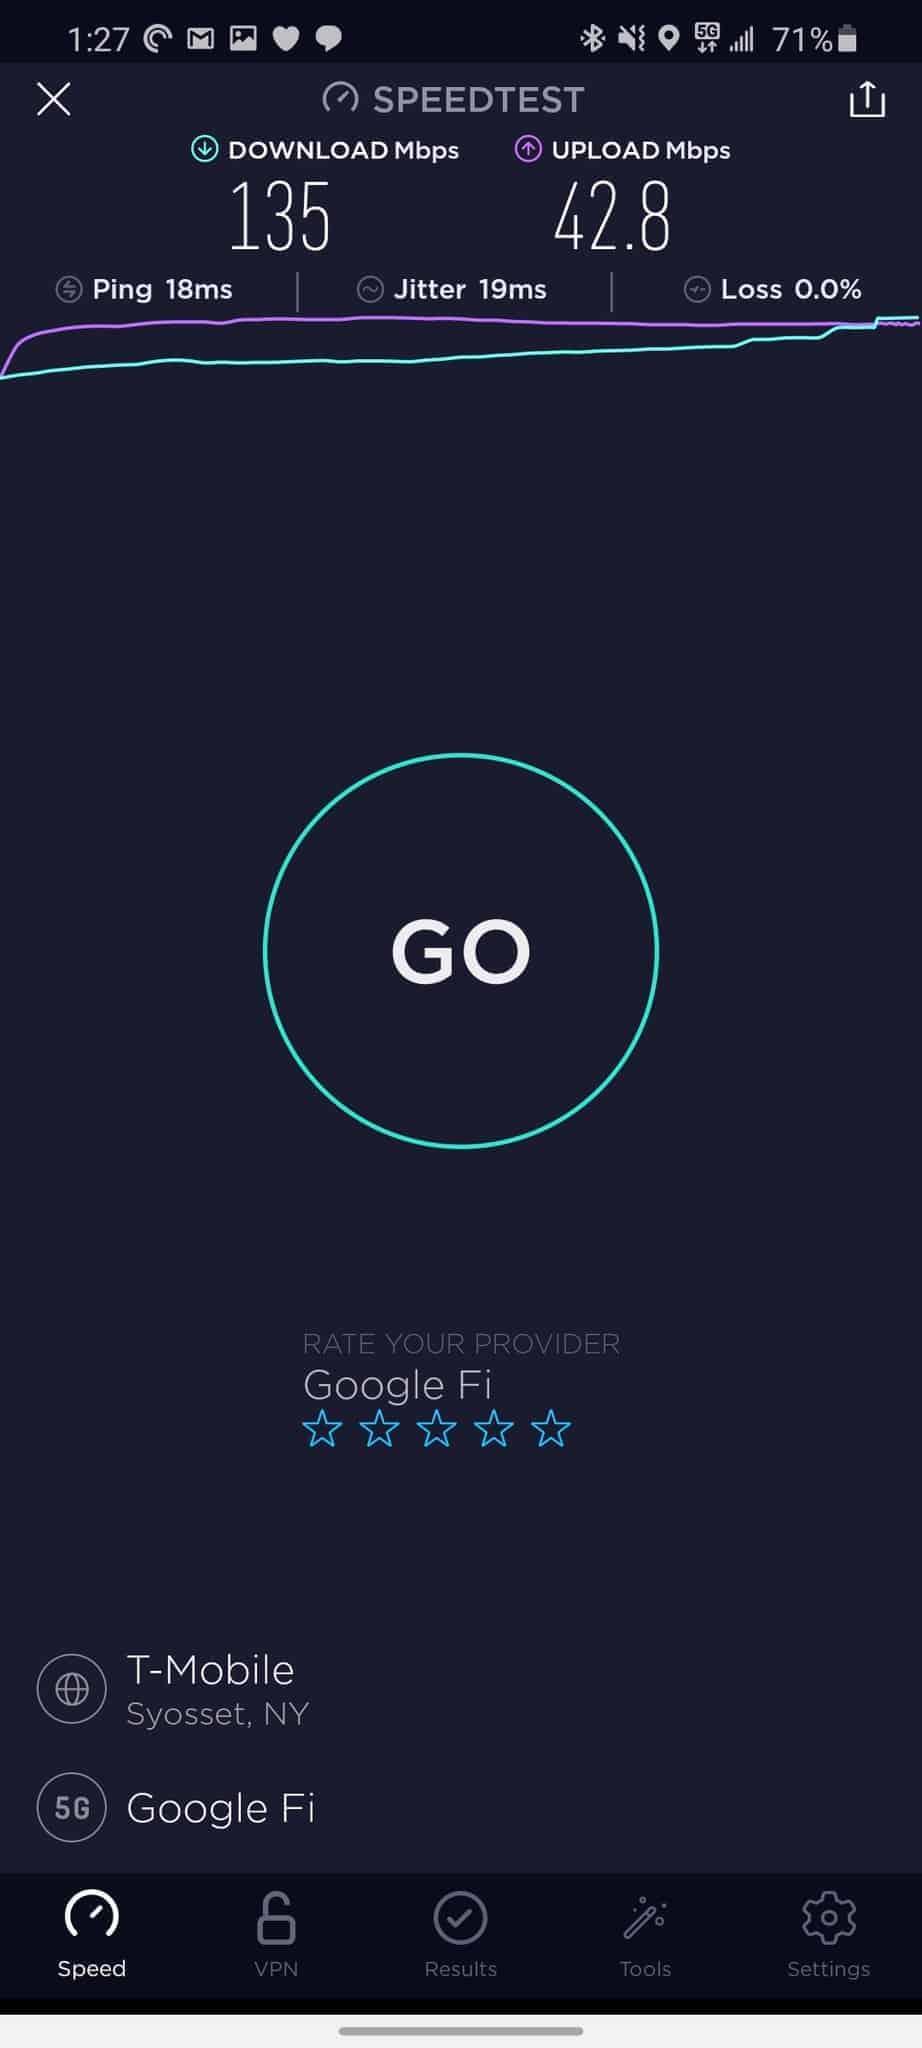 Google Fi T-Mobile 5G speed test 1